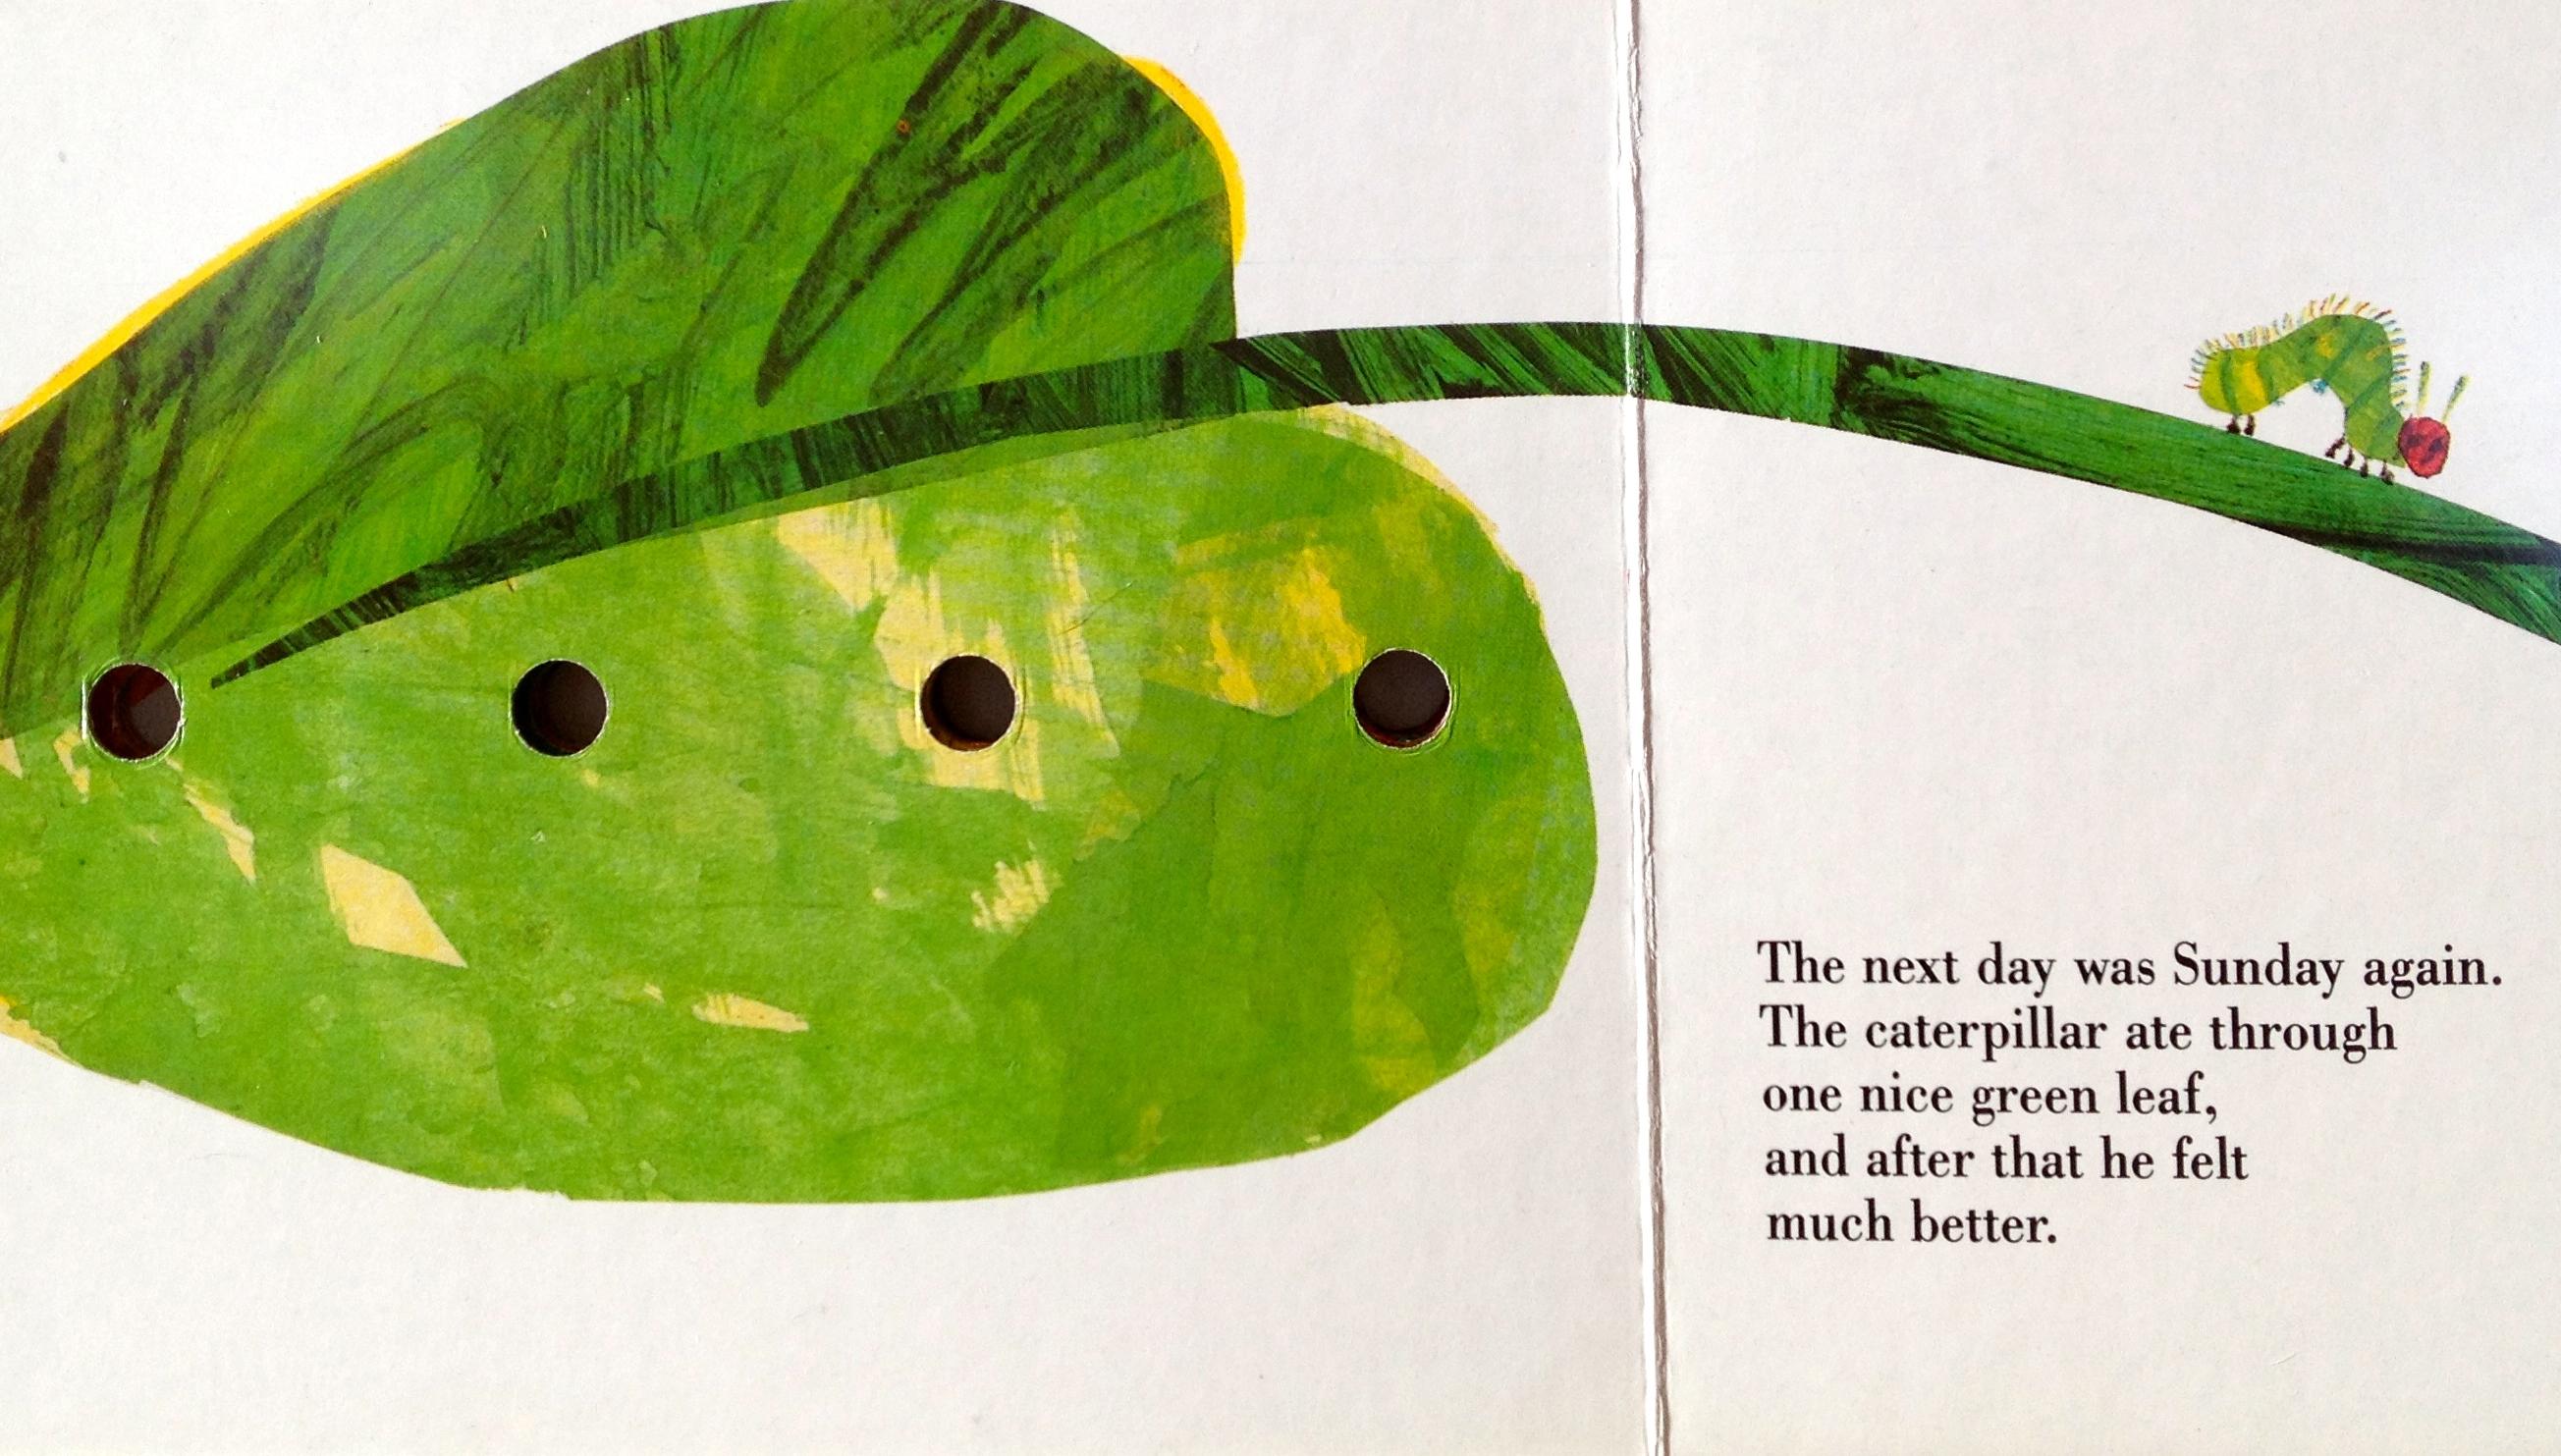 The Wisdom Of One Nice Green Leaf – The Wisdom Daily